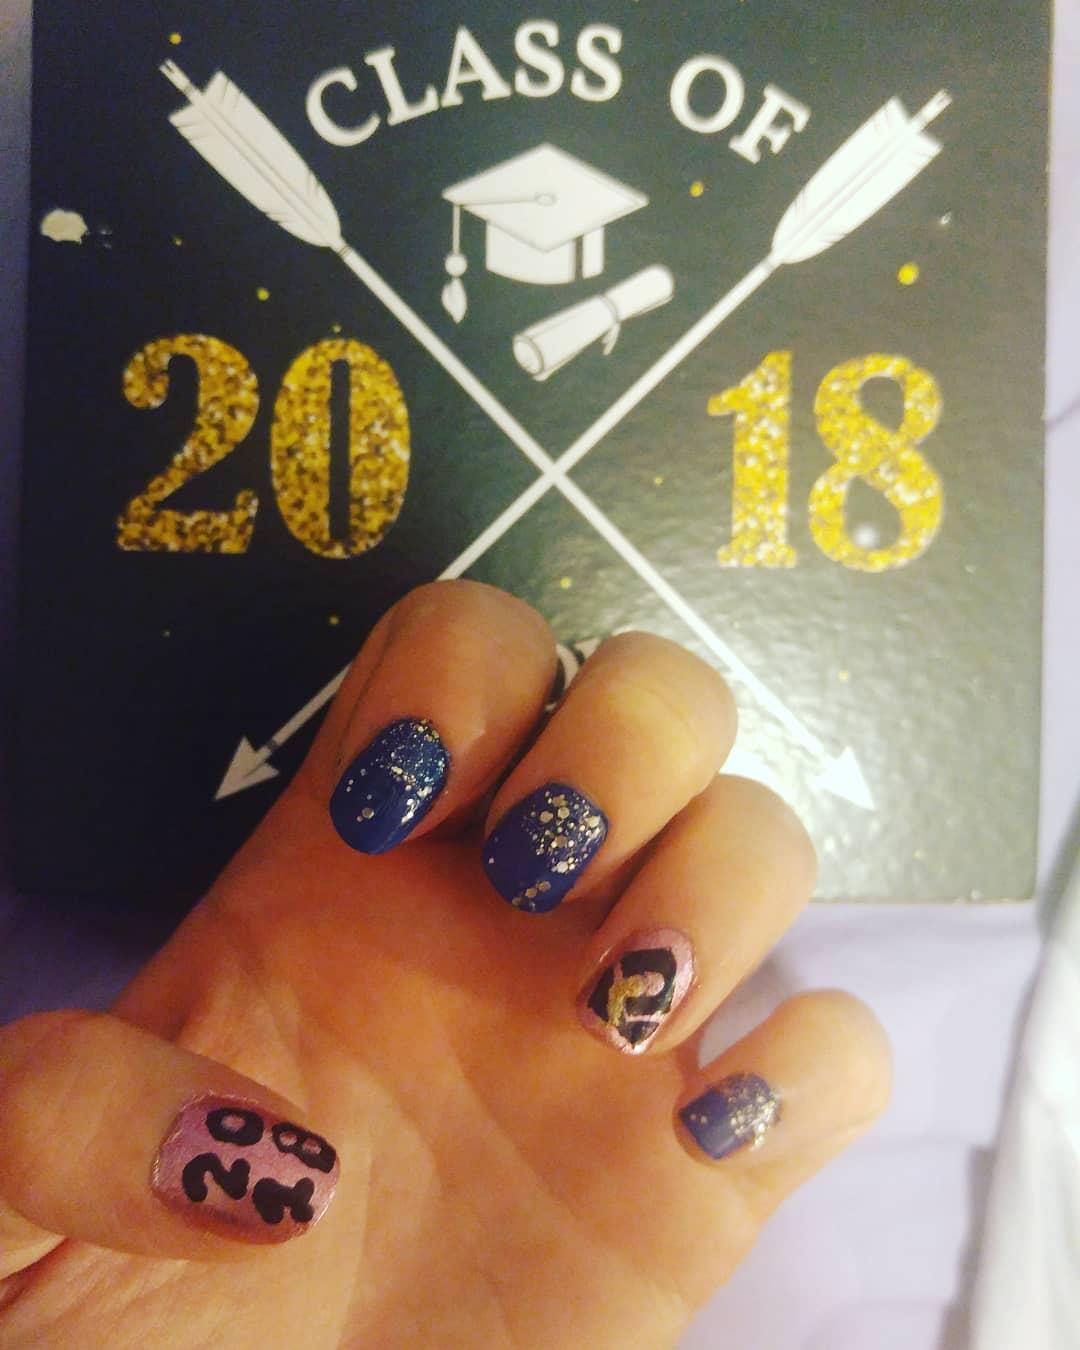 Dazzling graduation nails design. Pic by nailsbypayton044